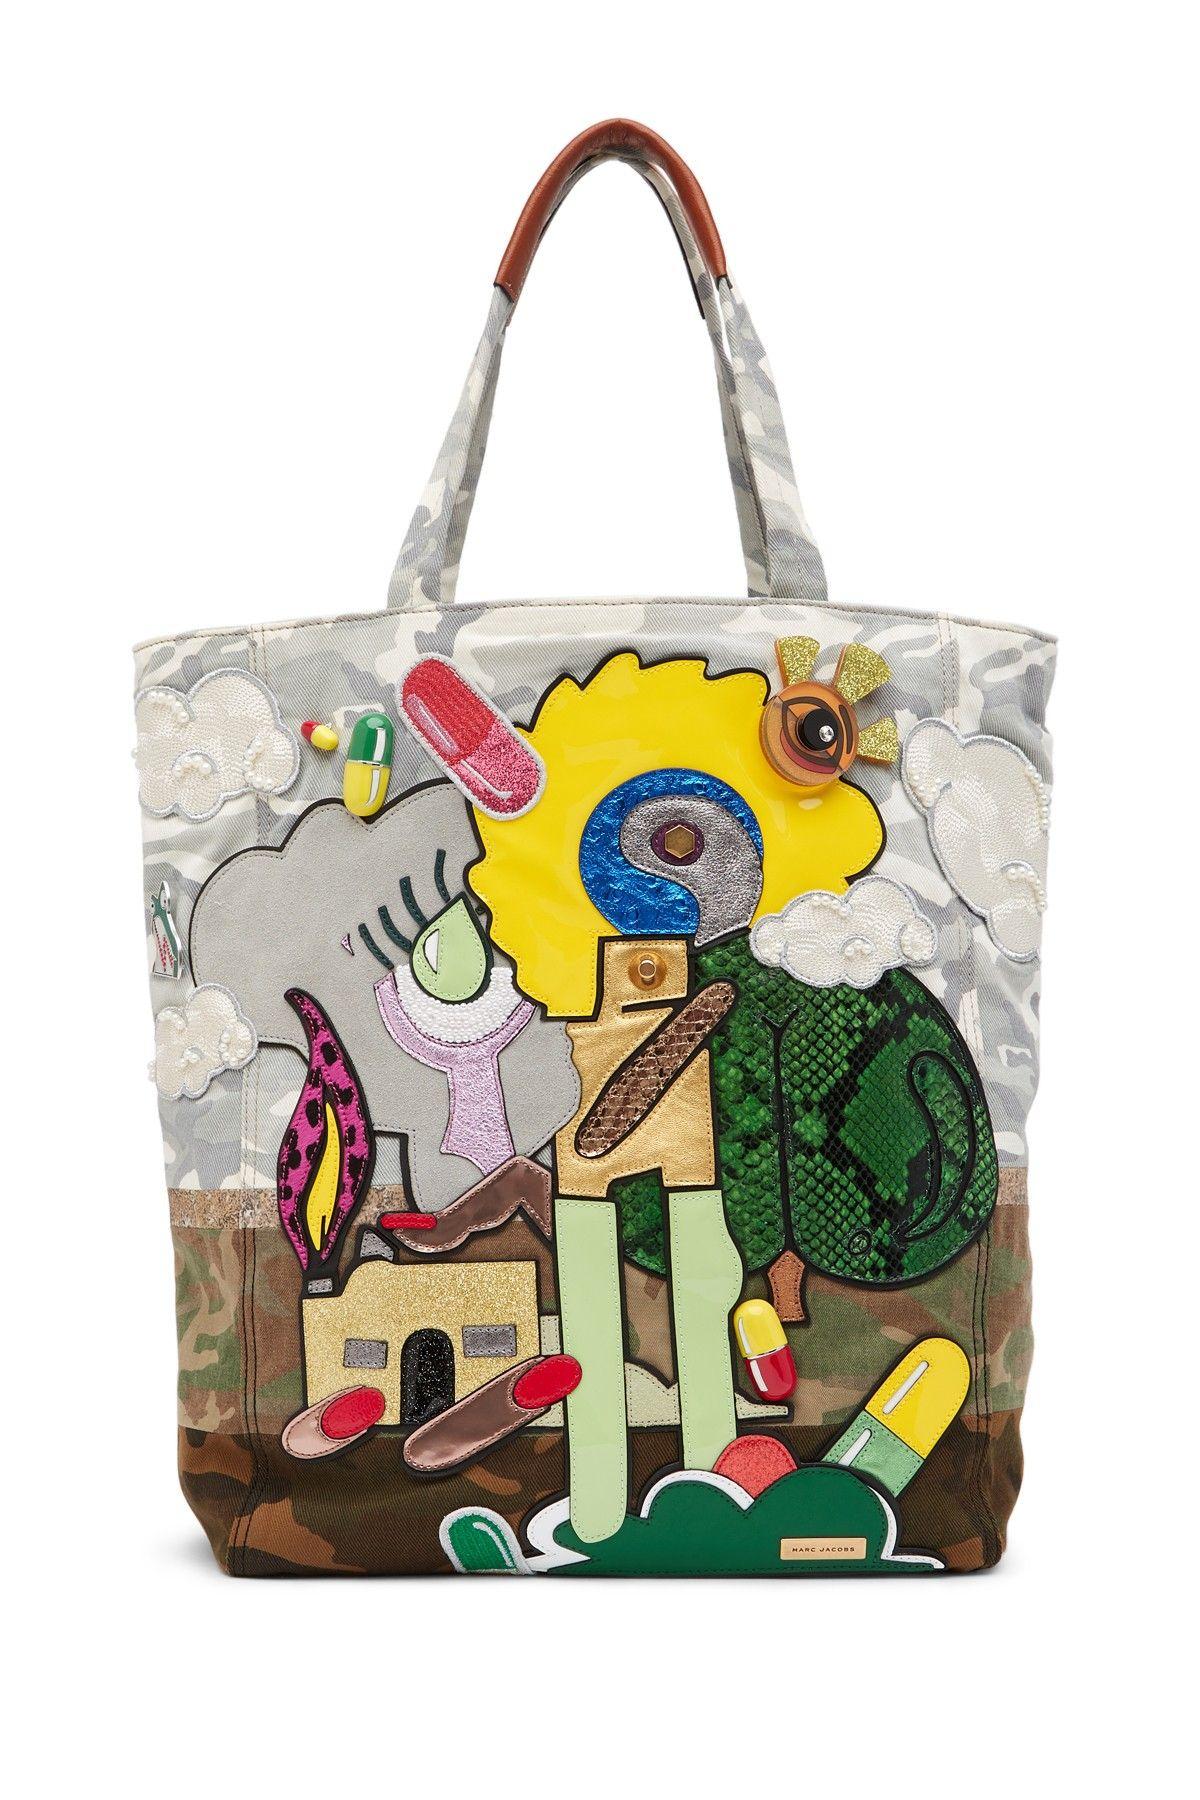 a42087723042 Marc Jacobs Julie Verhoeven Camo Print Tote Bag